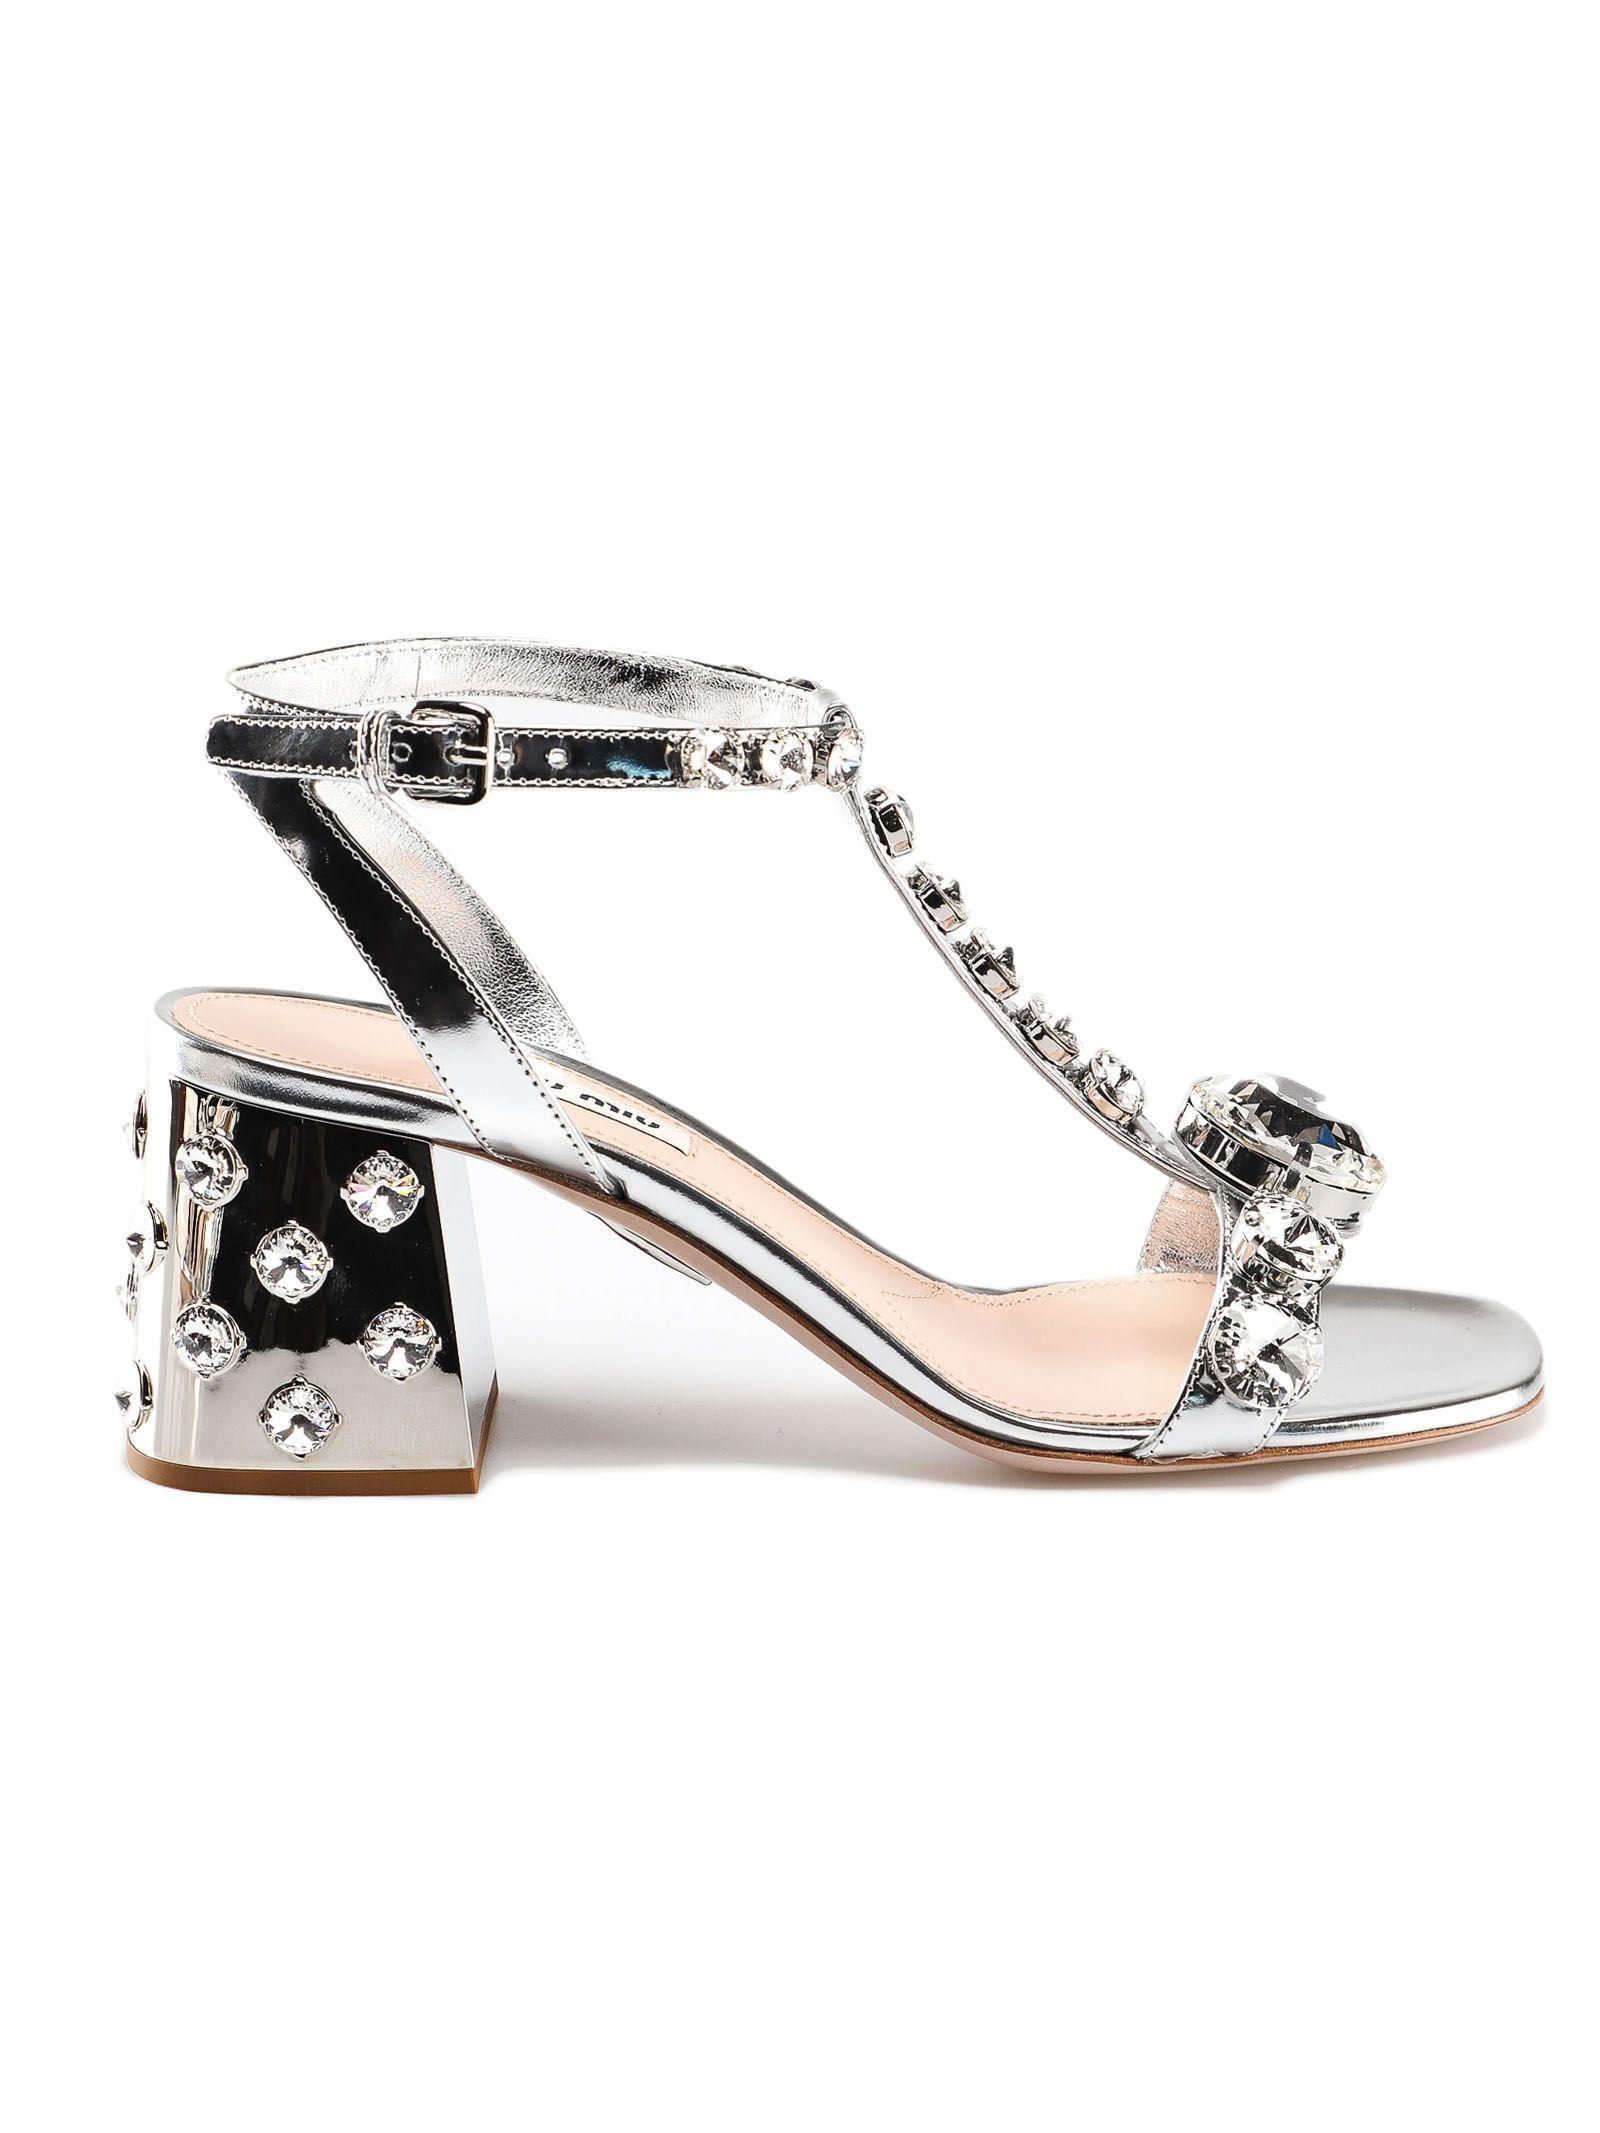 3addd6360 Miu Miu Miu Miu Crystal Embellished Sandals - Argento - 10848985 ...